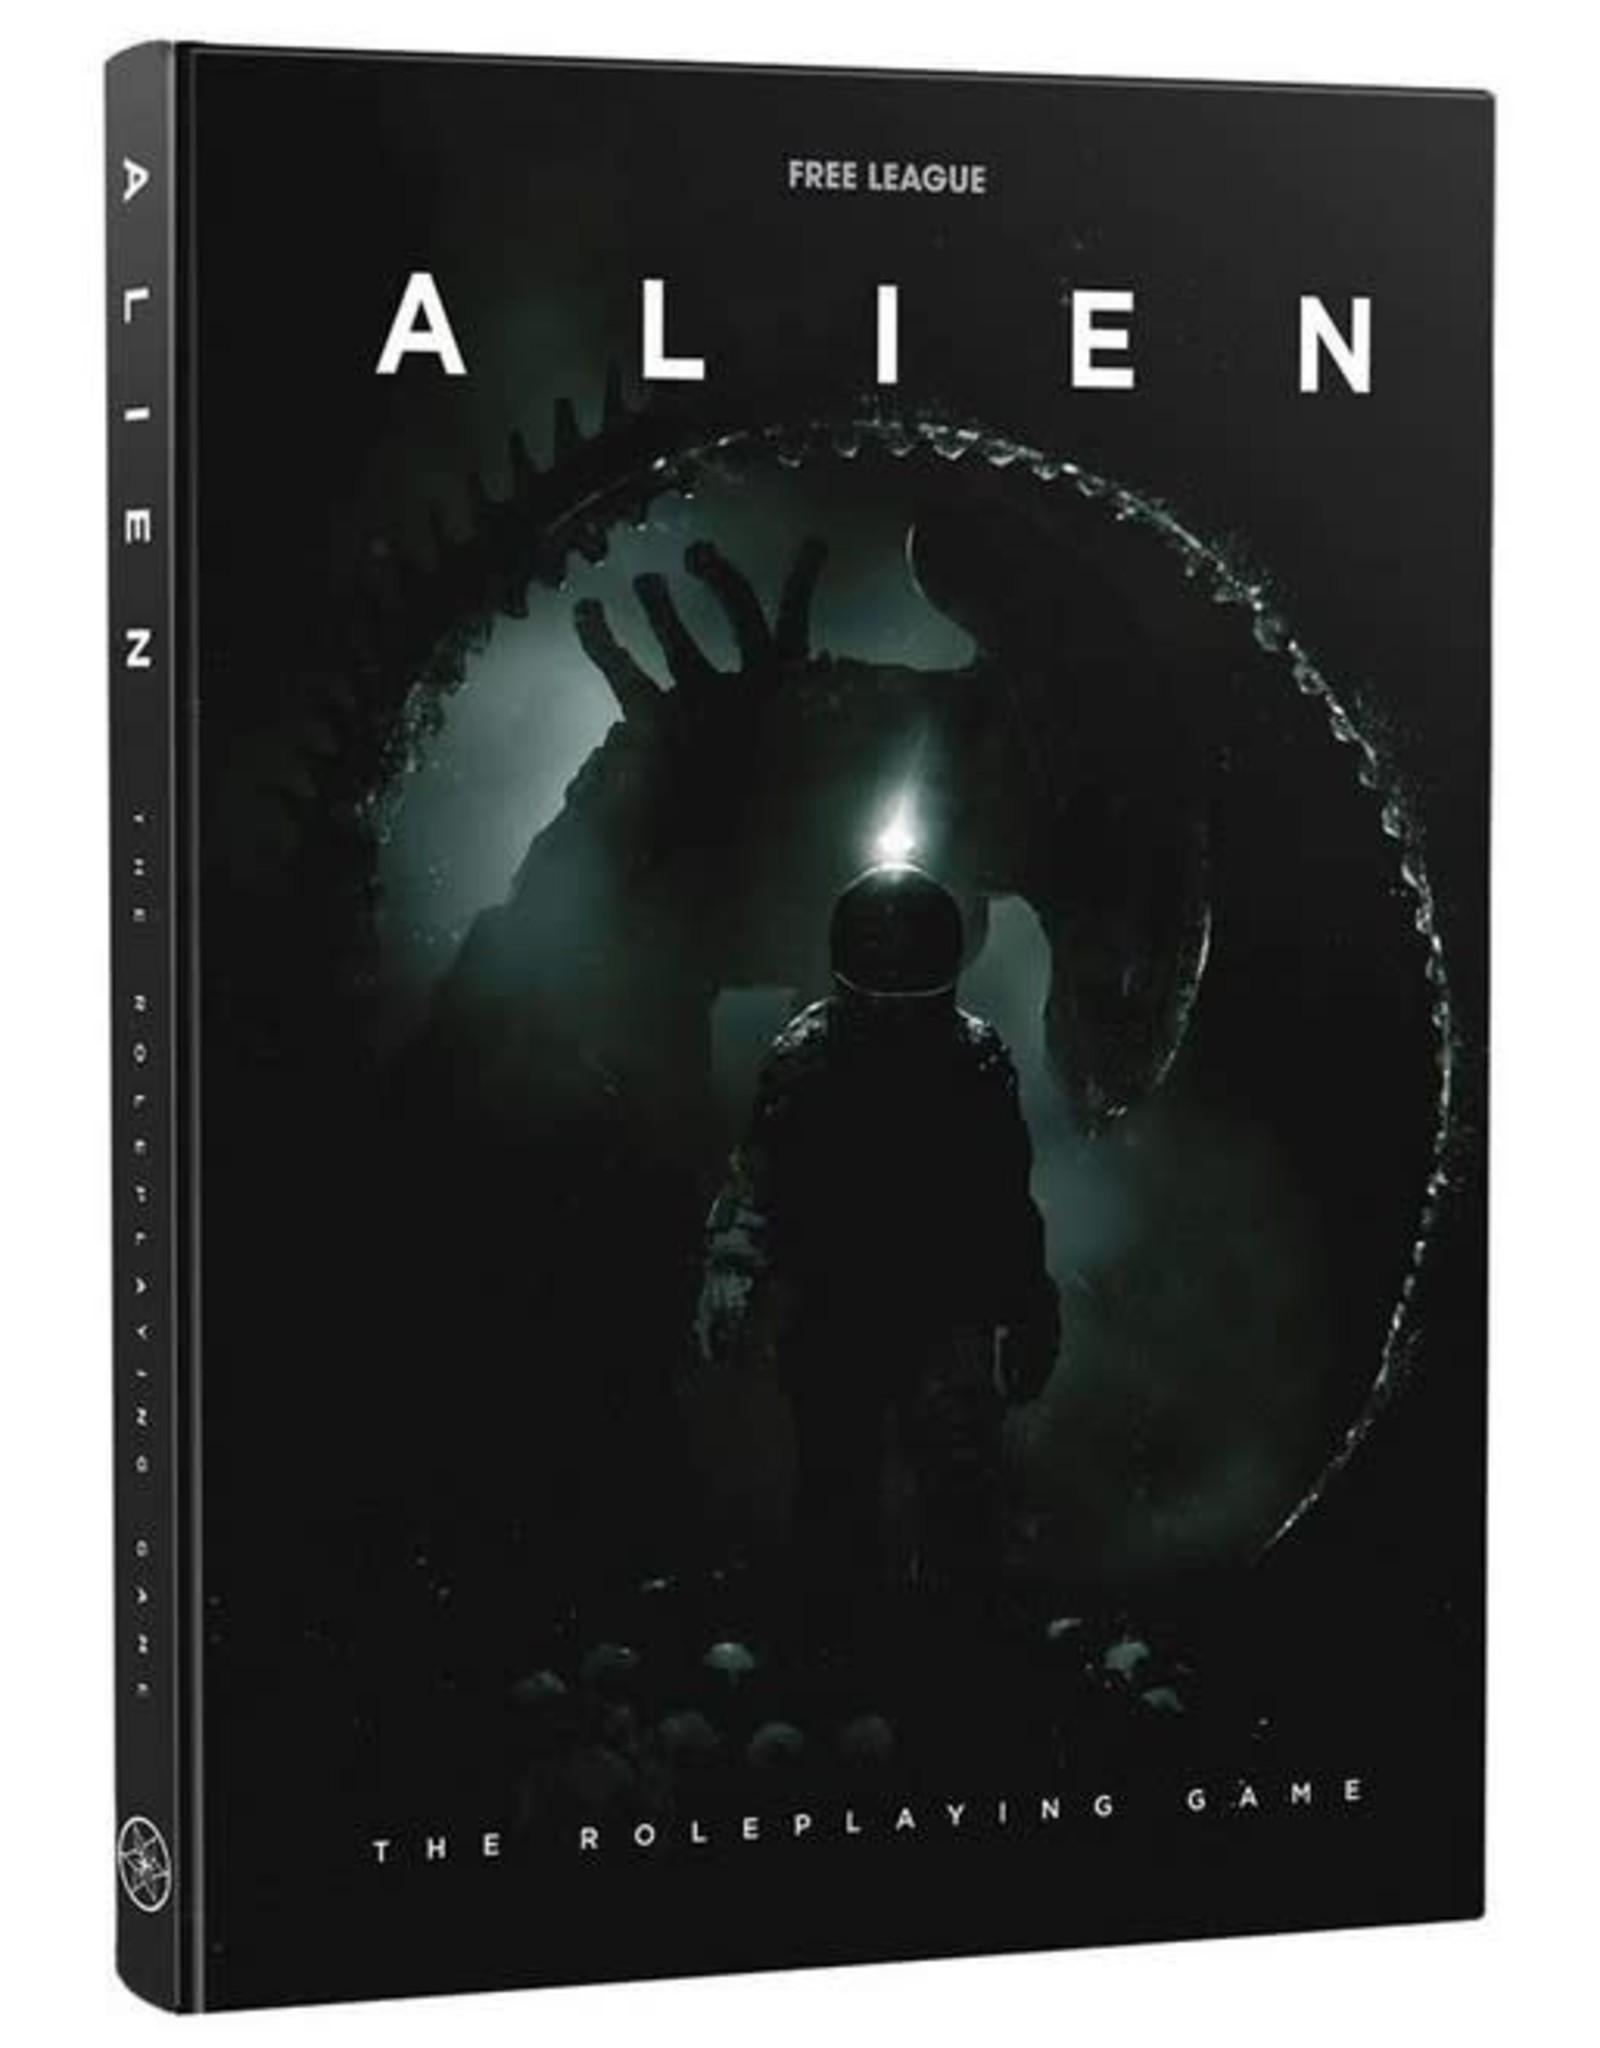 Free League Alien RPG Core Book